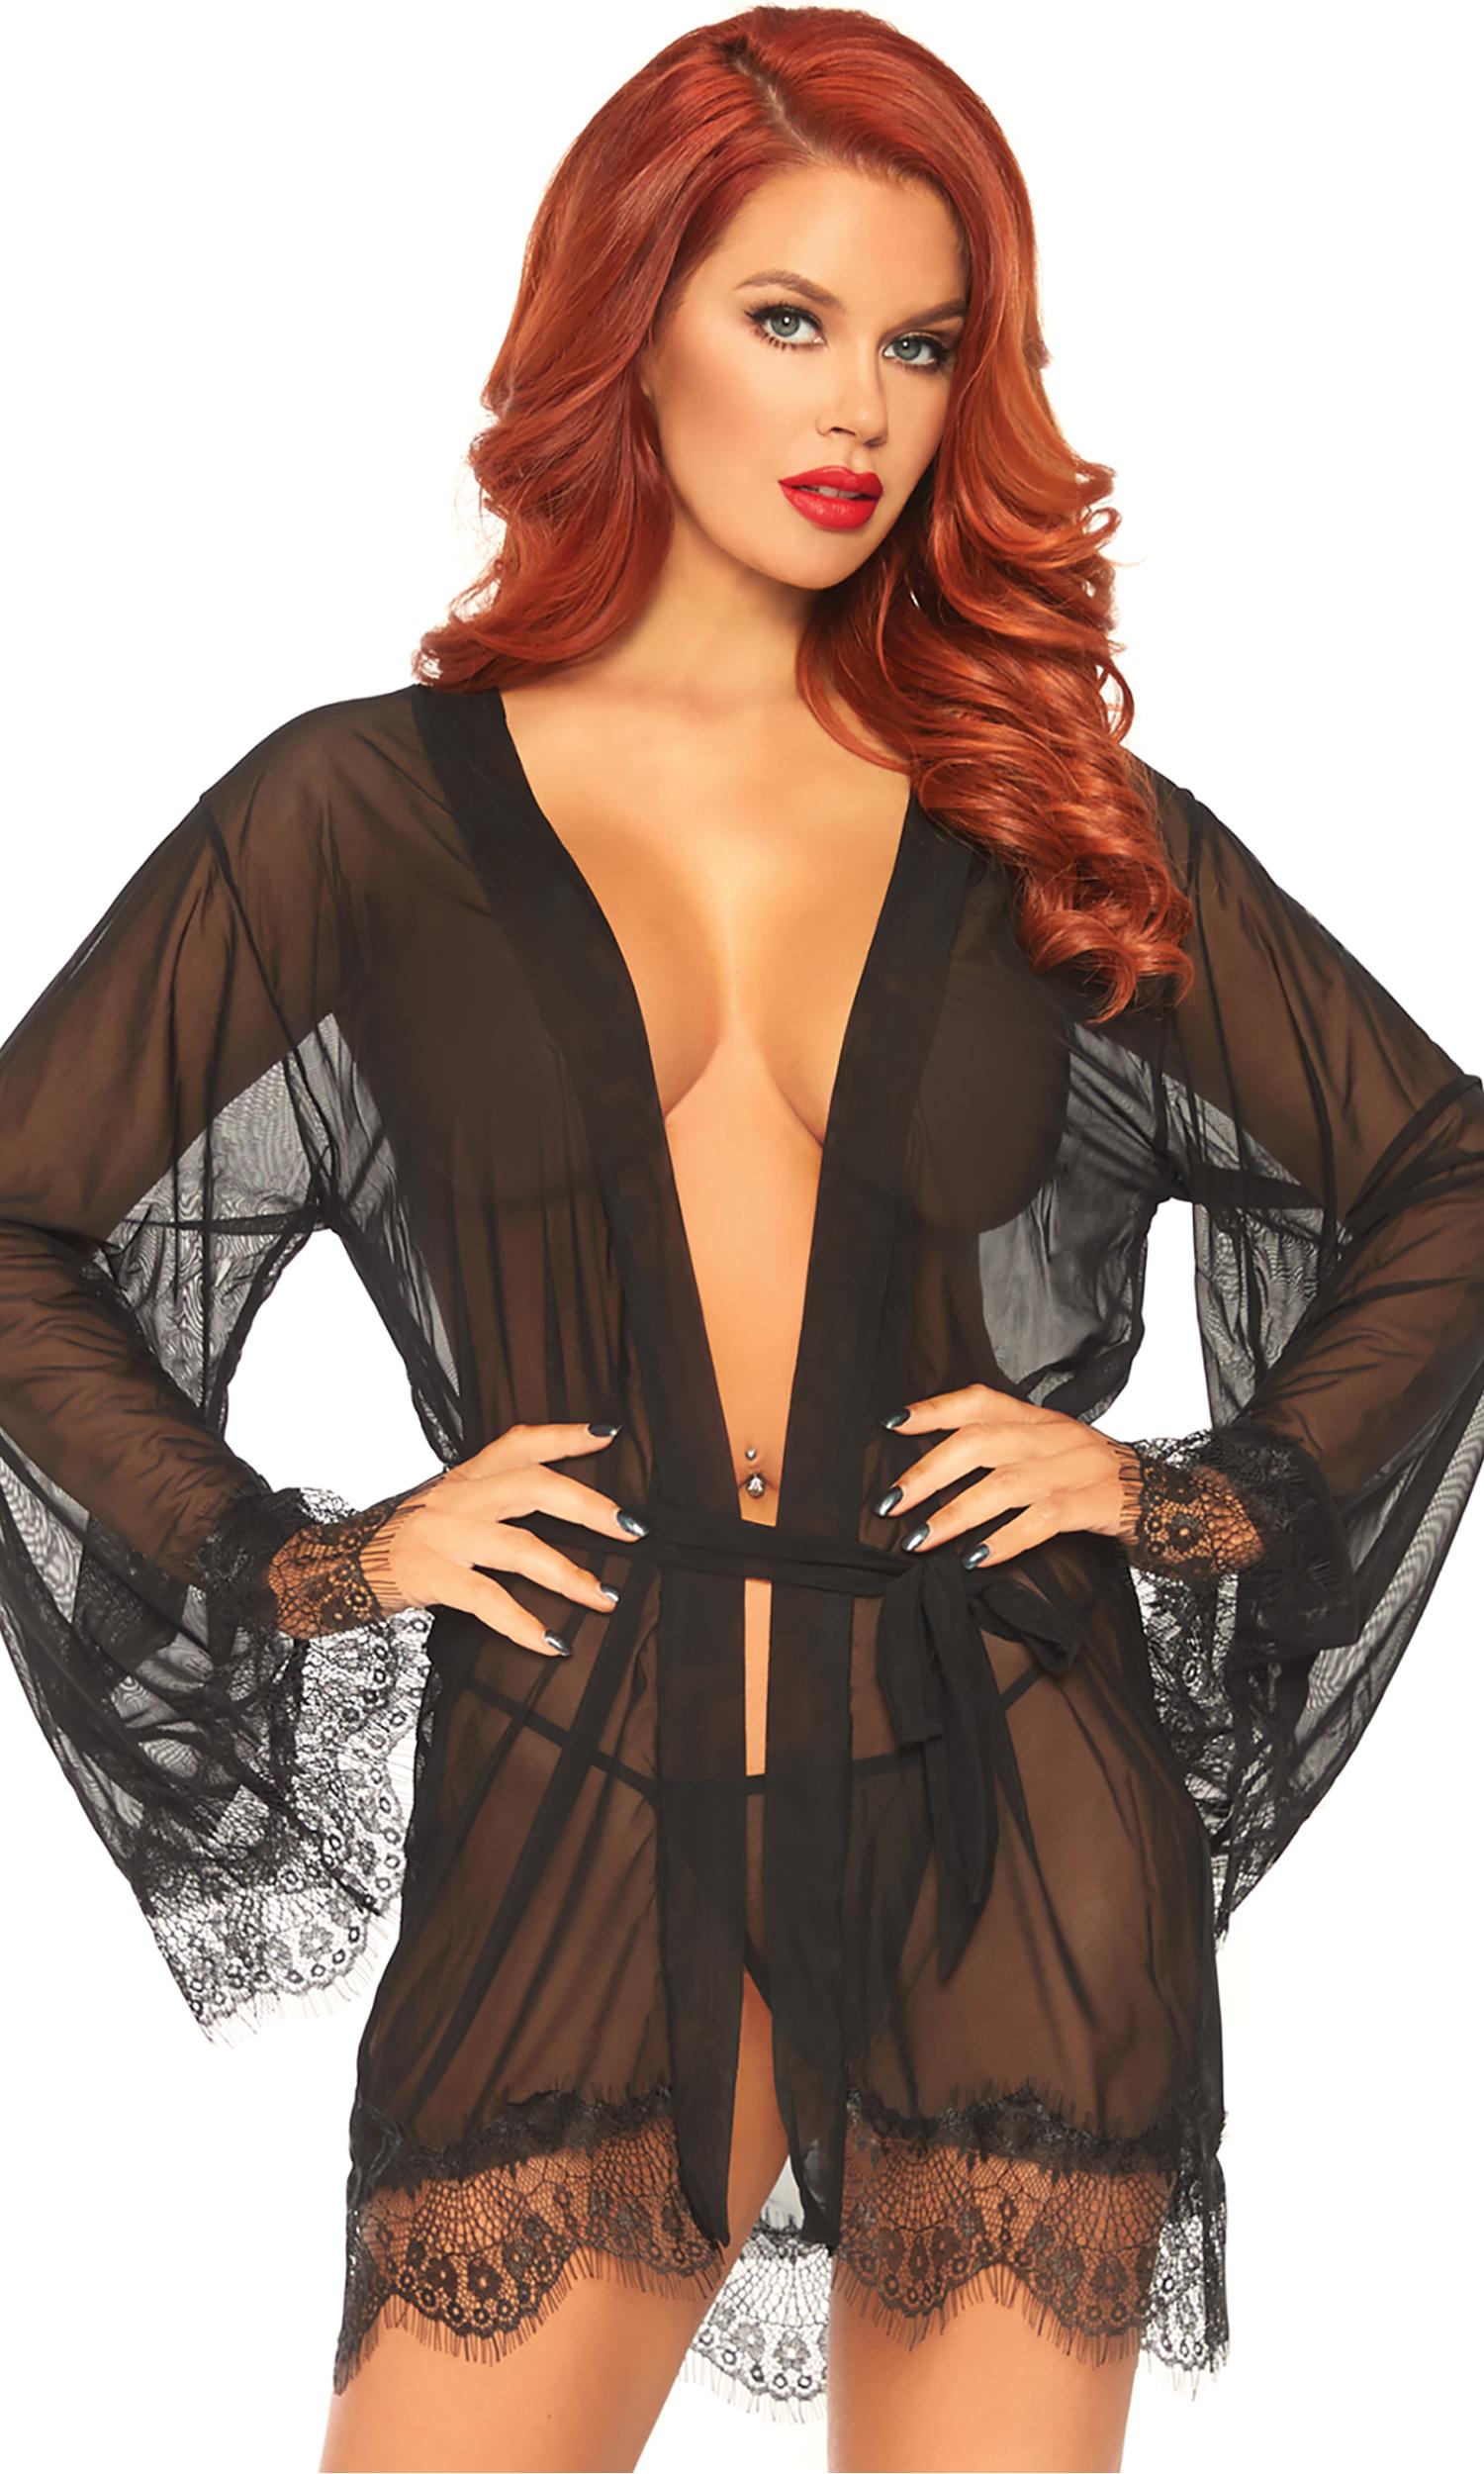 c9bc837aff3 Women s Sexy Robes